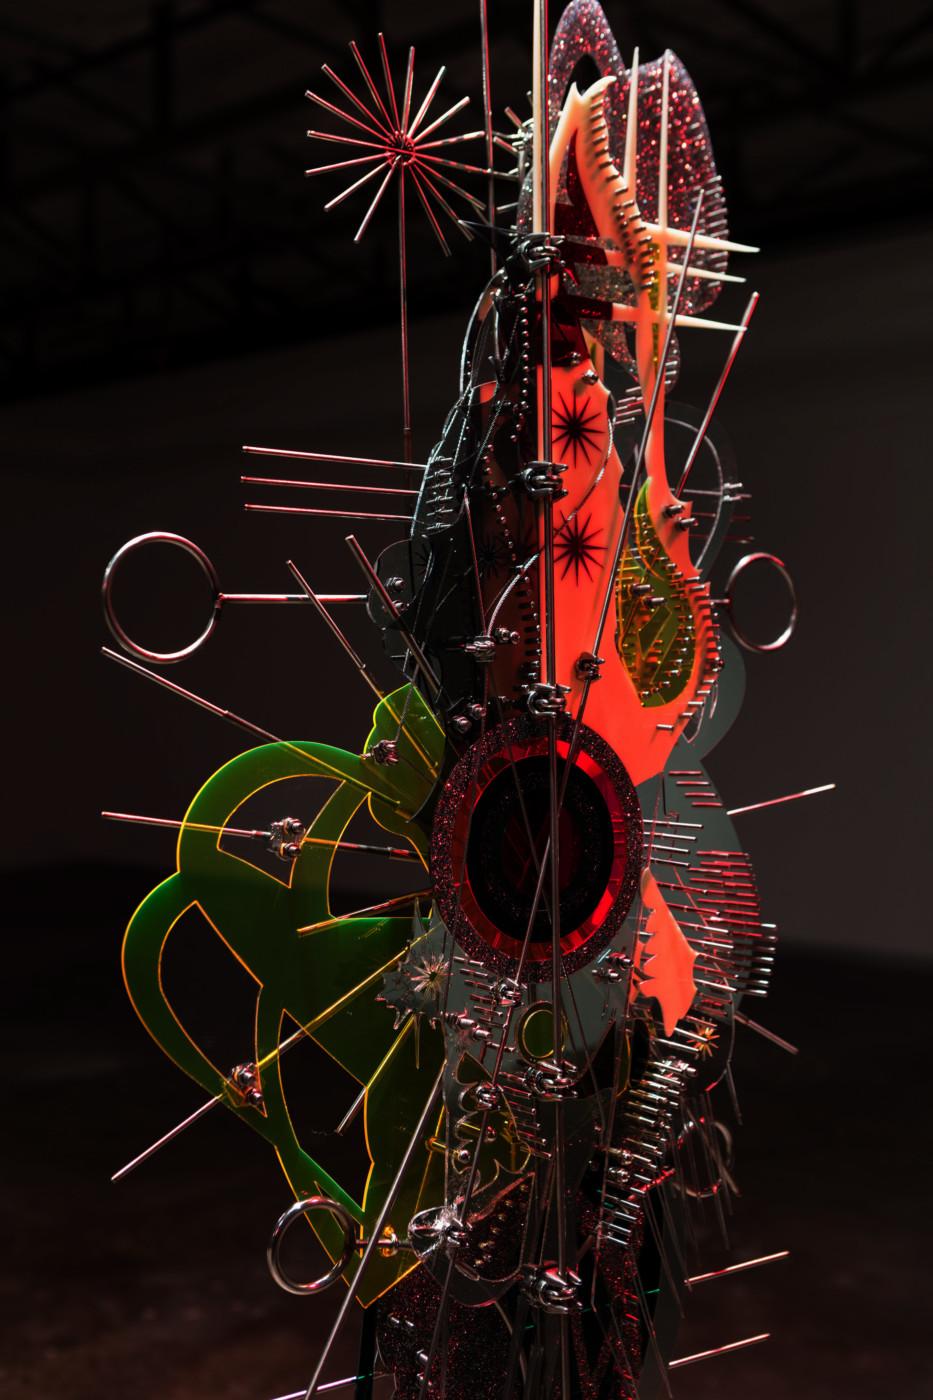 VALERIE KEANE  Prosthetic God  (detail), 2018 Acrylic, stainless steel Variable dimensions - High Art Gallery Paris